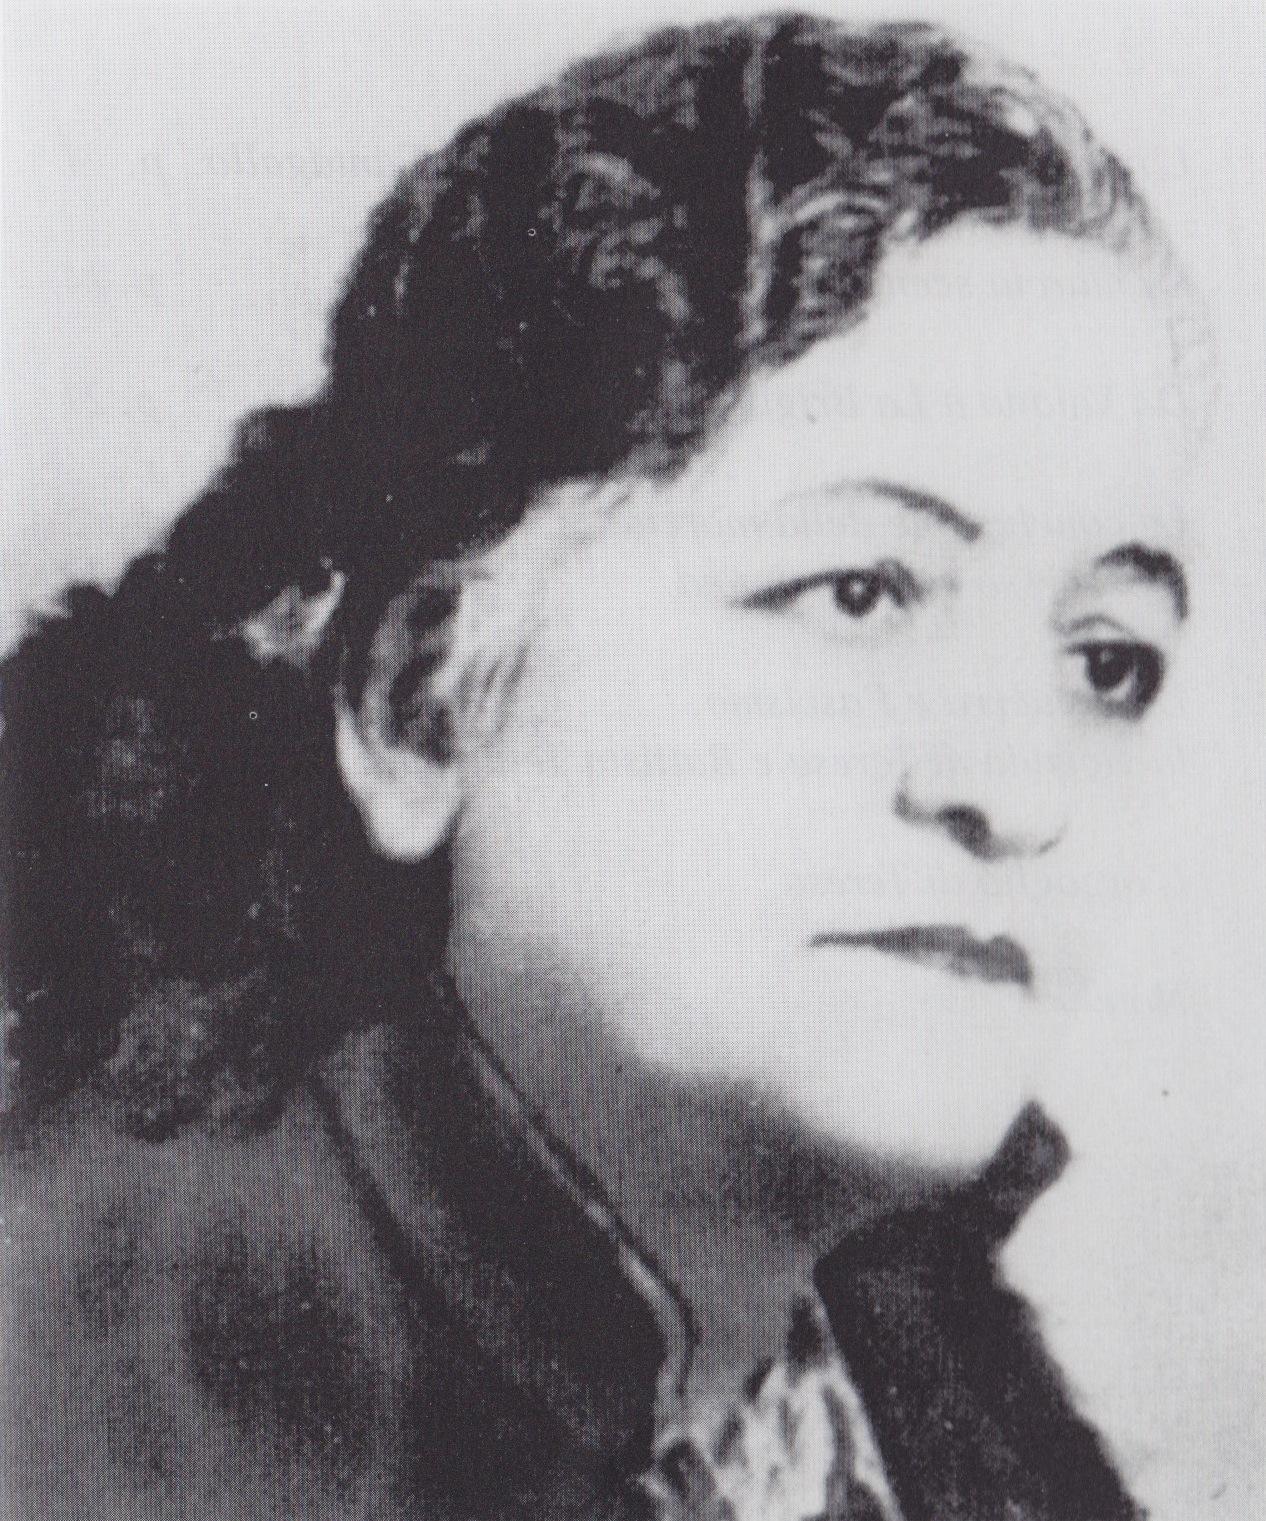 Teresa Meroni, fine anni '20.